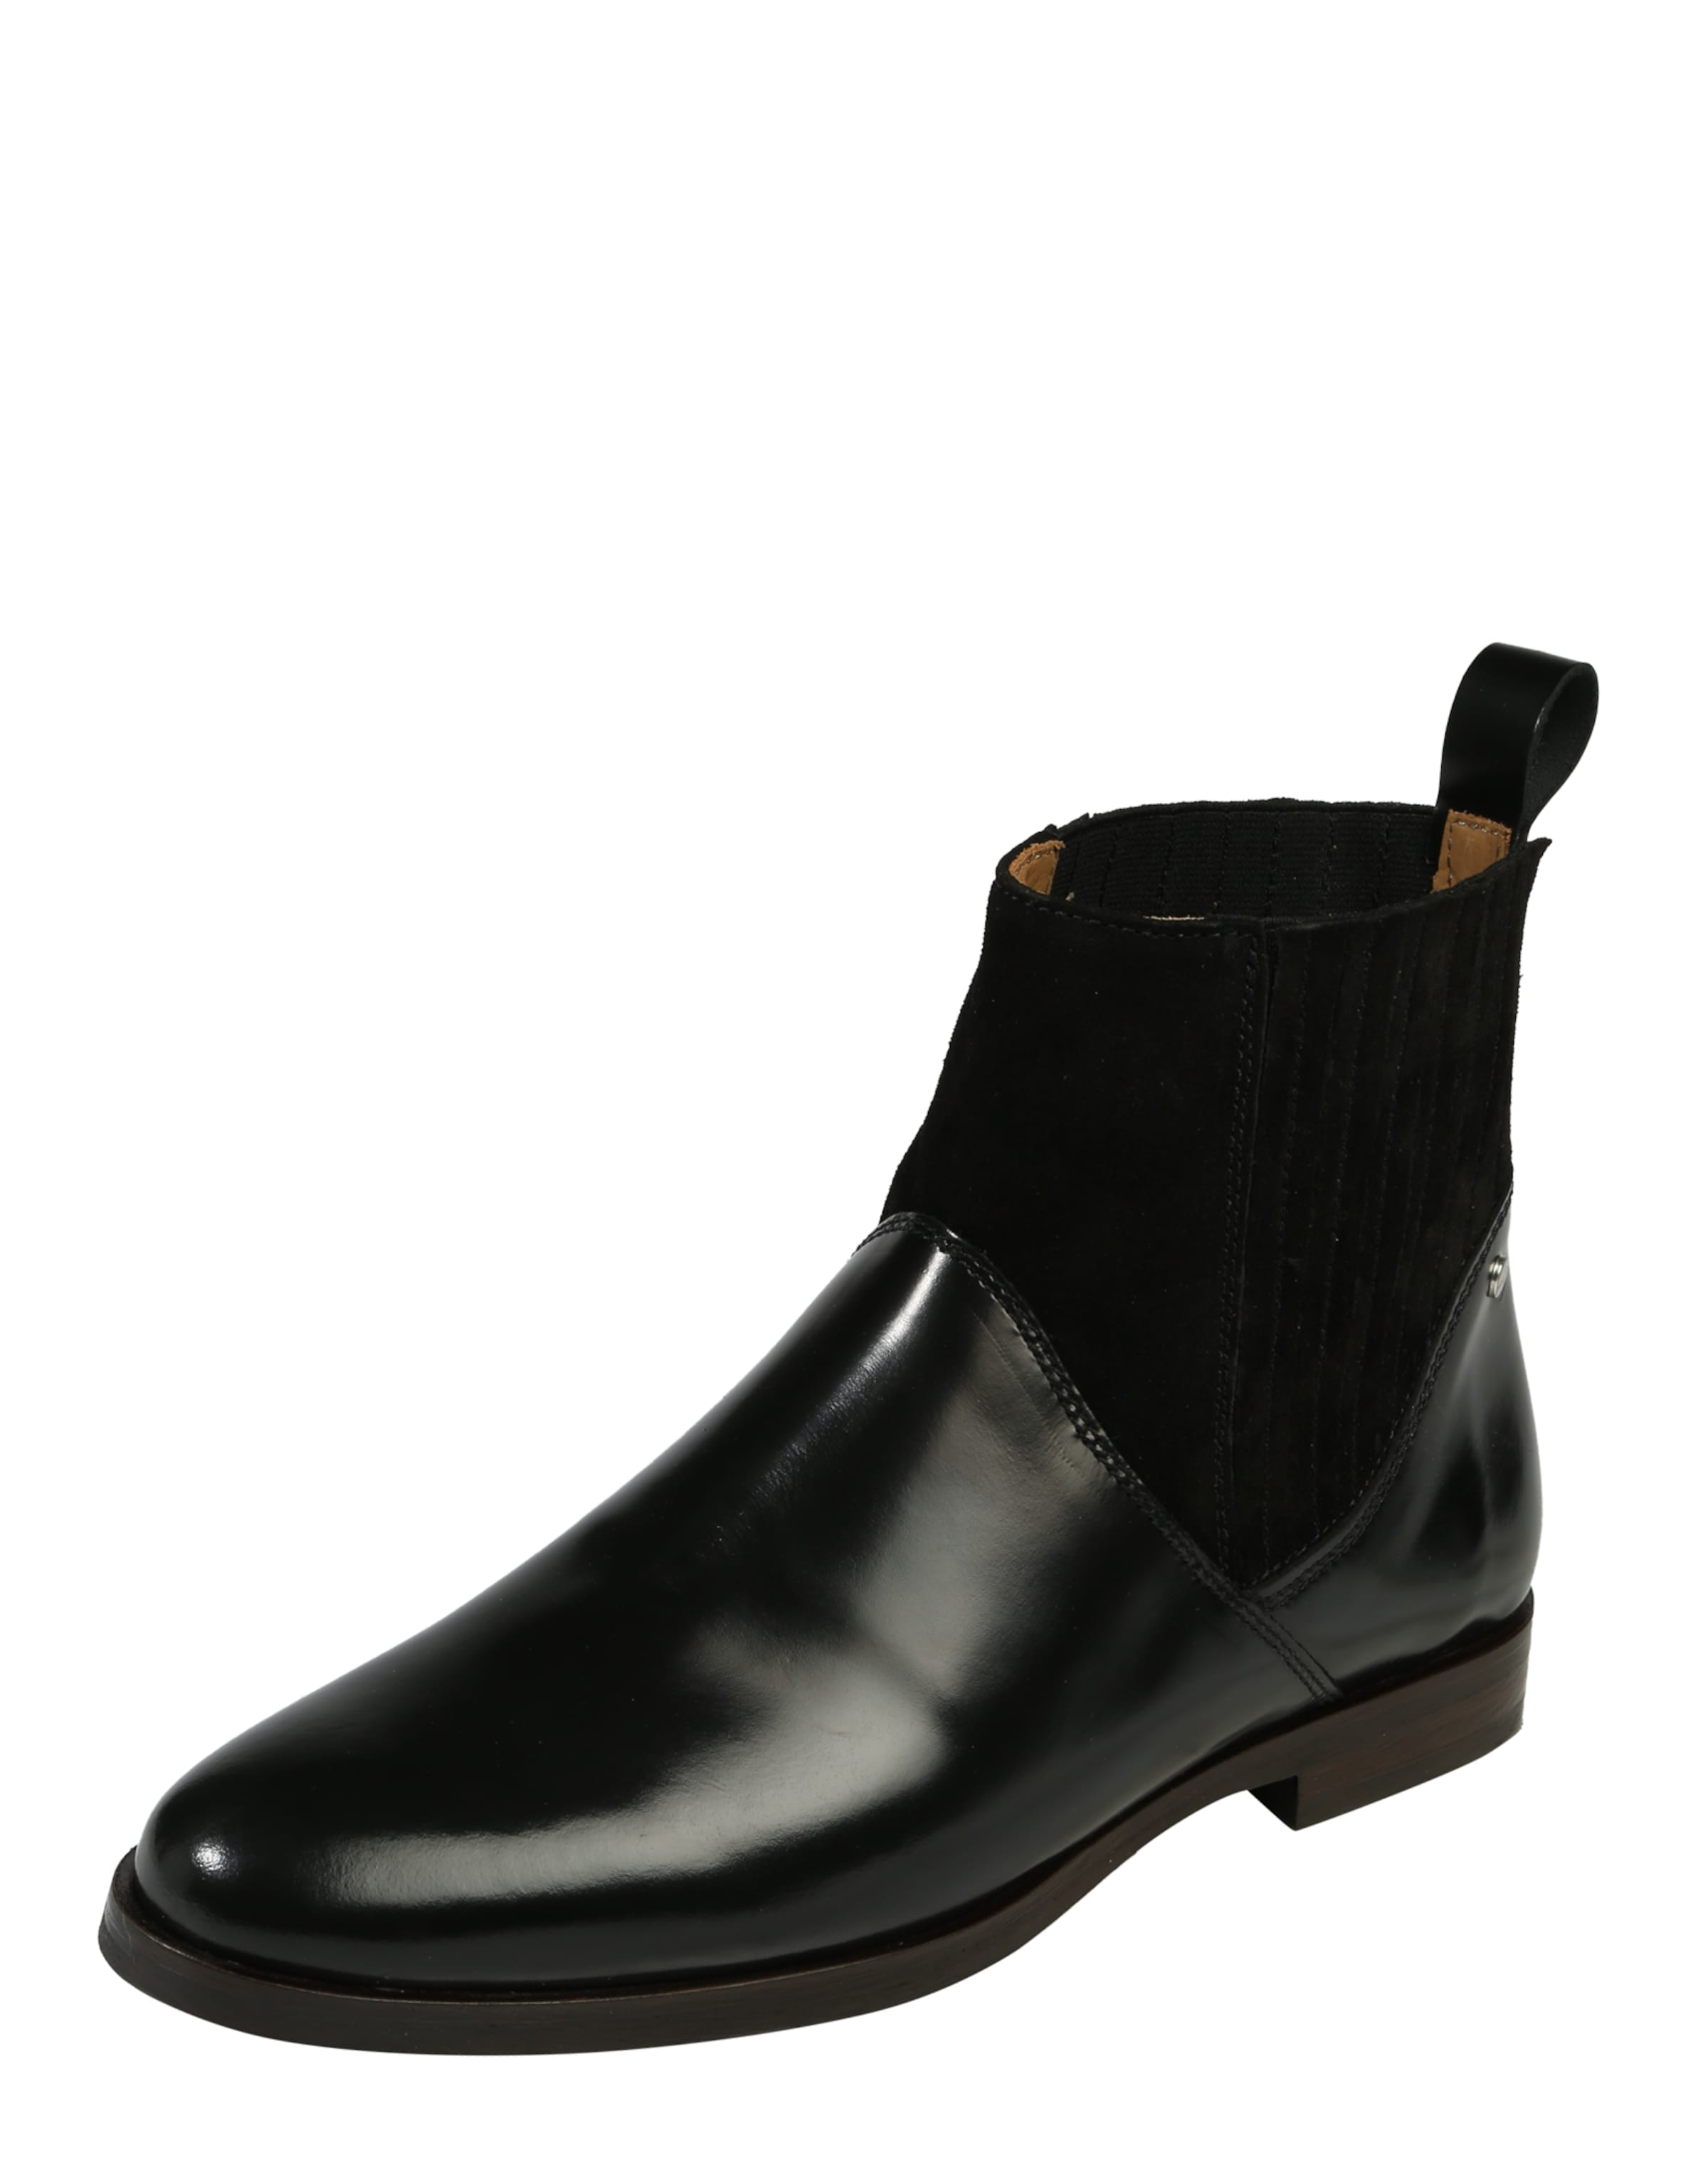 GANT Chelsea-Boot Nicole Verschleißfeste billige Schuhe